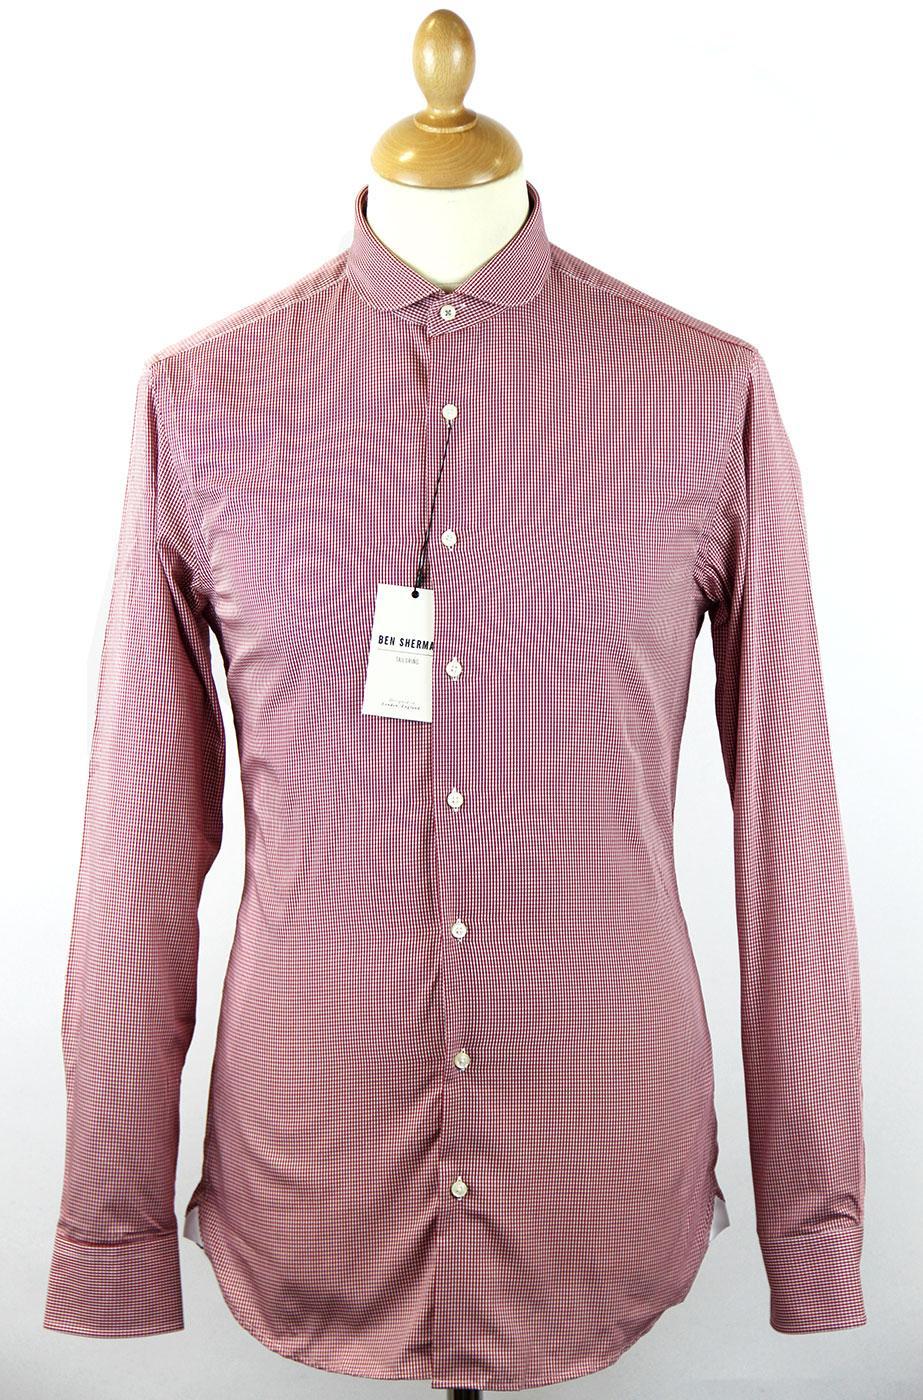 Ben Sherman Retro Mod Tailored Gingham Penny Collar Shirt Red